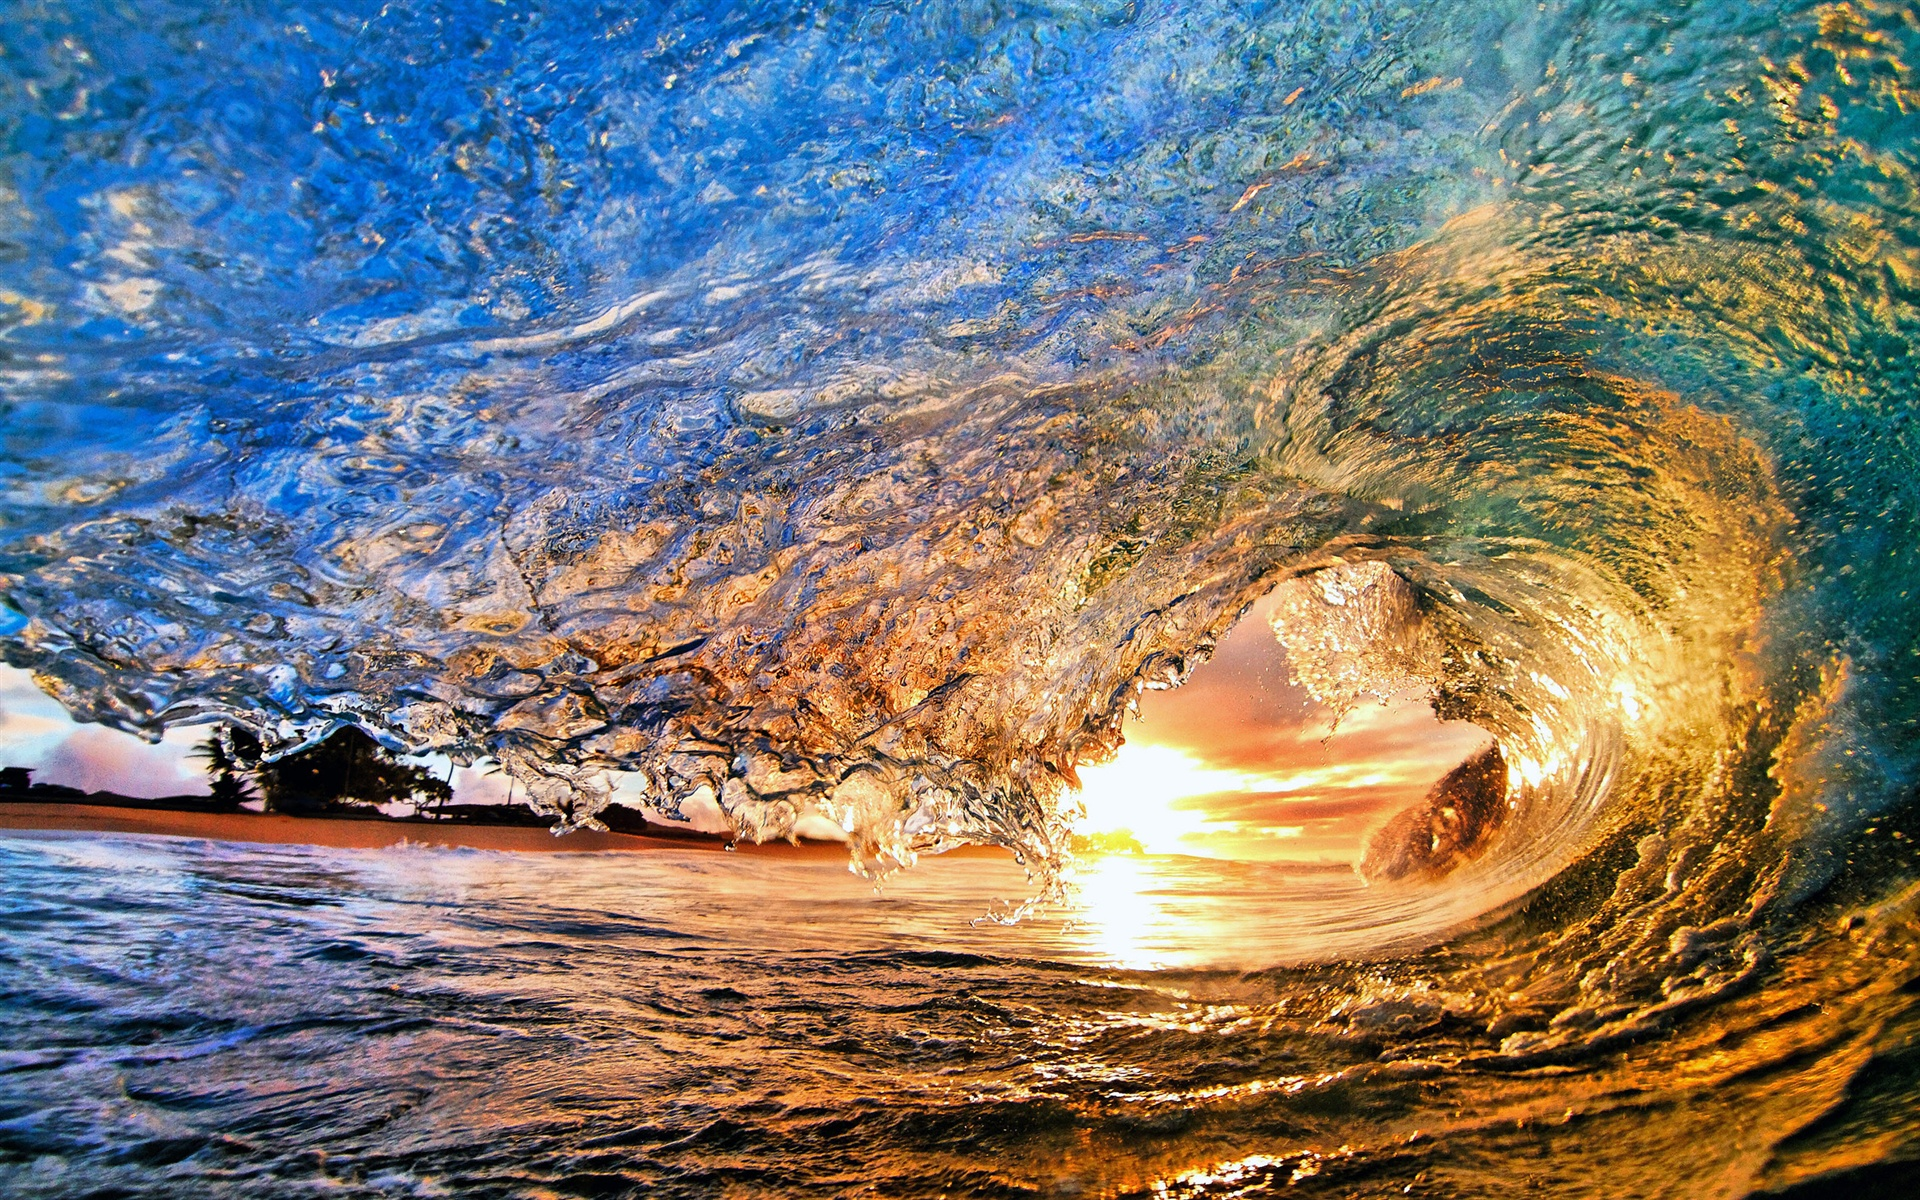 wave wallpaper background